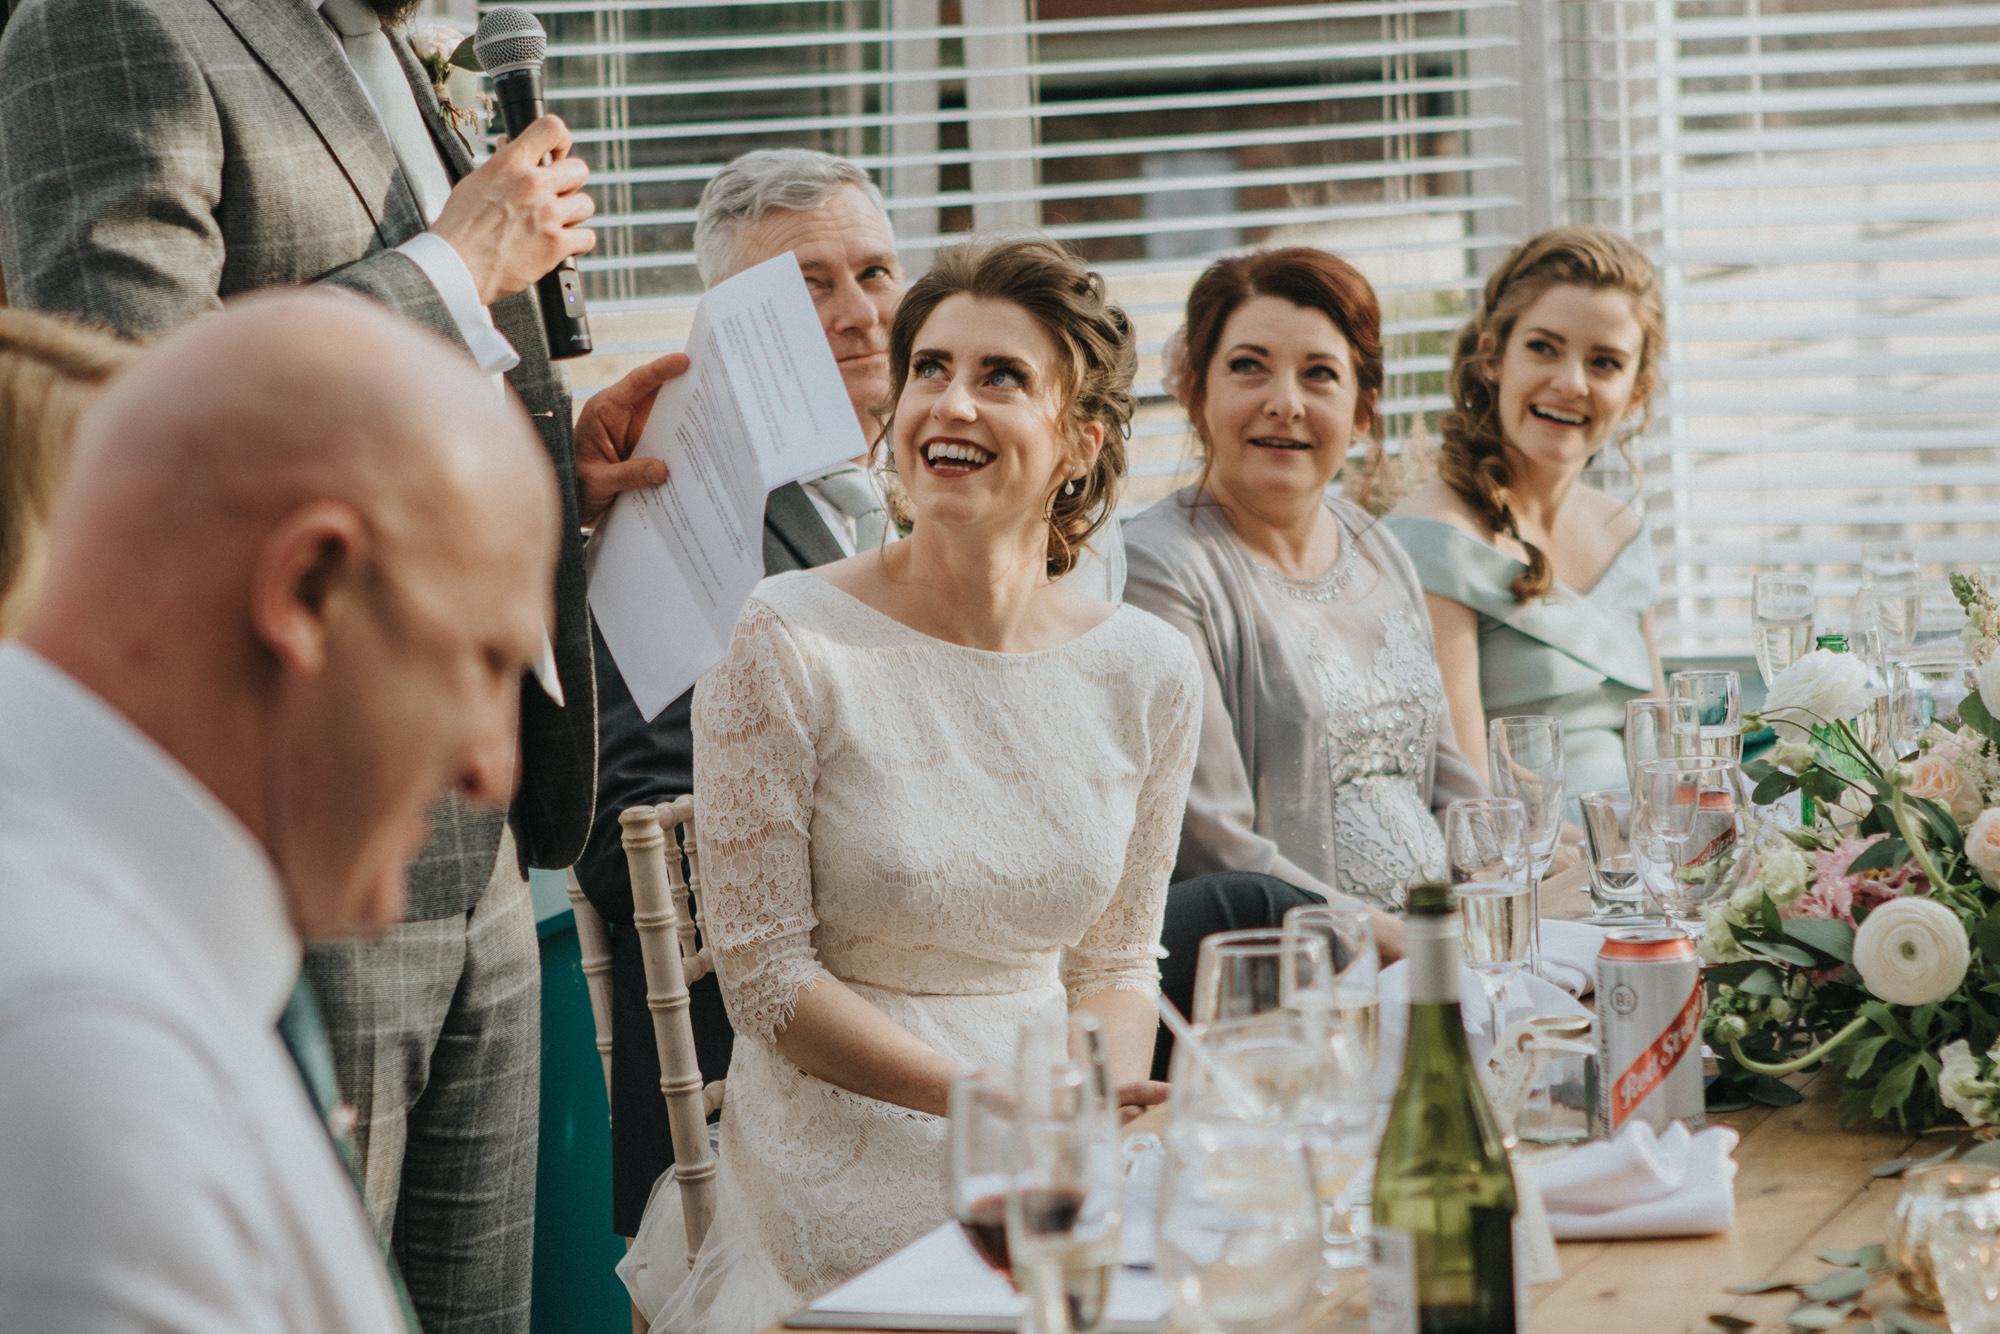 Kate-Beaumont-Lace-Flared-Dahlia-Gown-Leeds-Wedding-Bloom-Weddings-49.jpg